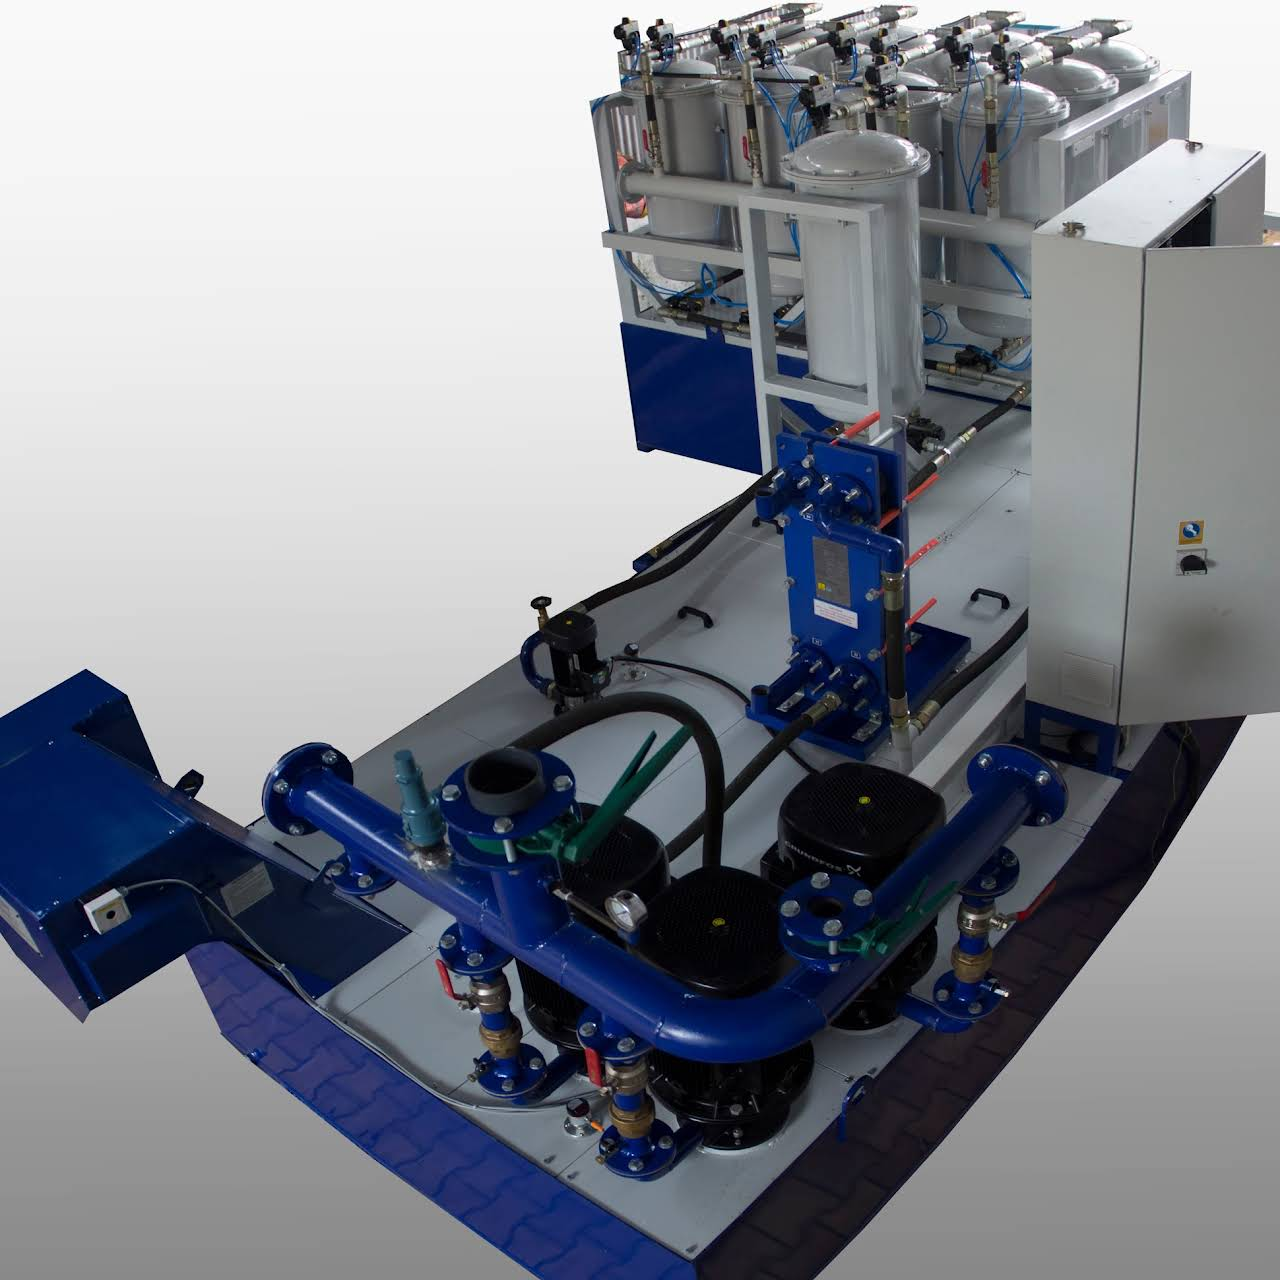 Transor India Pvt Ltd - Neat cutting oil filtration system